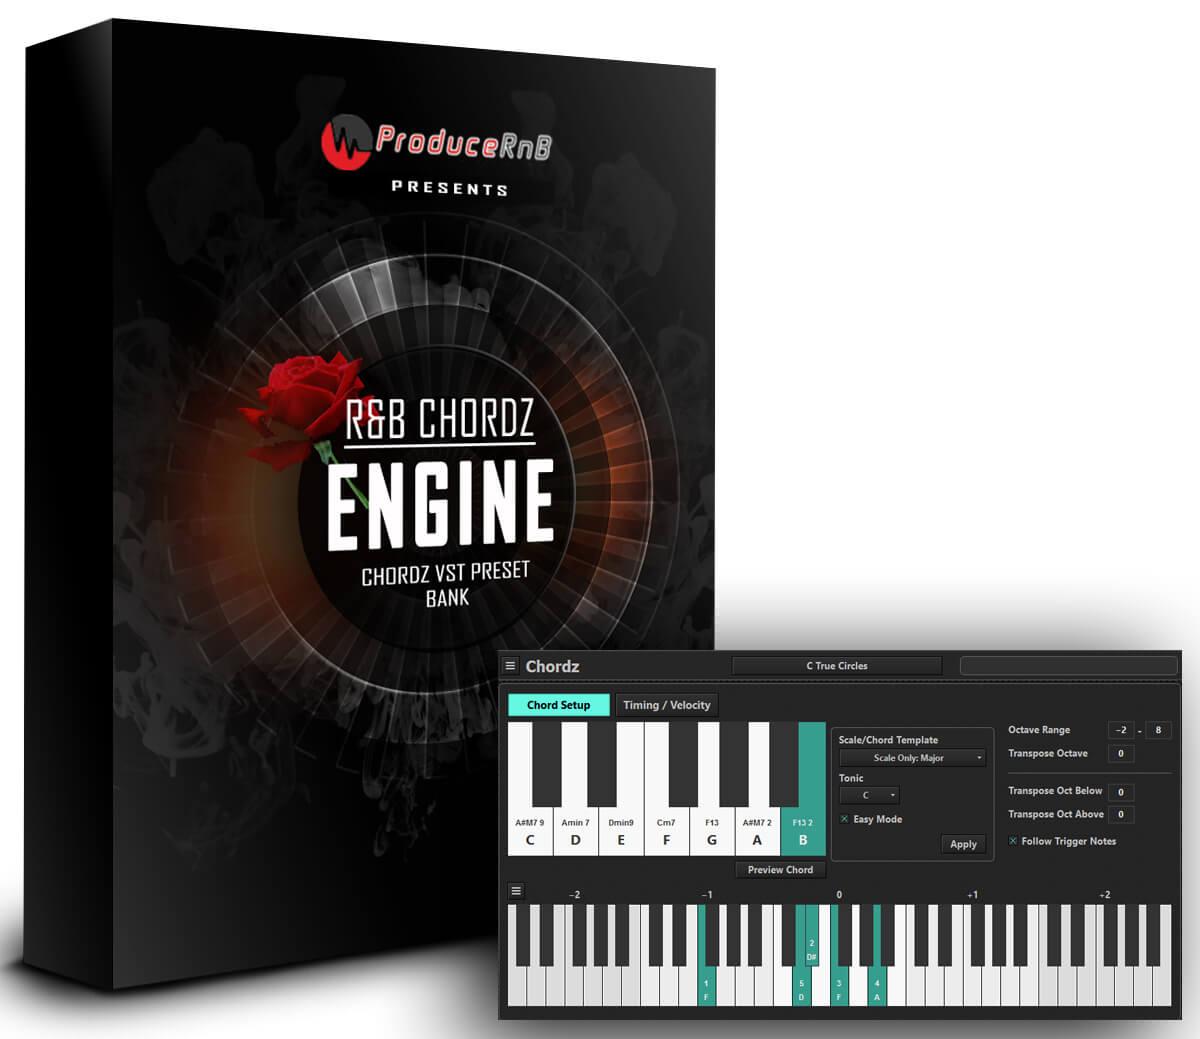 ProduceRNB - All 6 Engines Presets Crack (CHORDZ, CTHULHU)